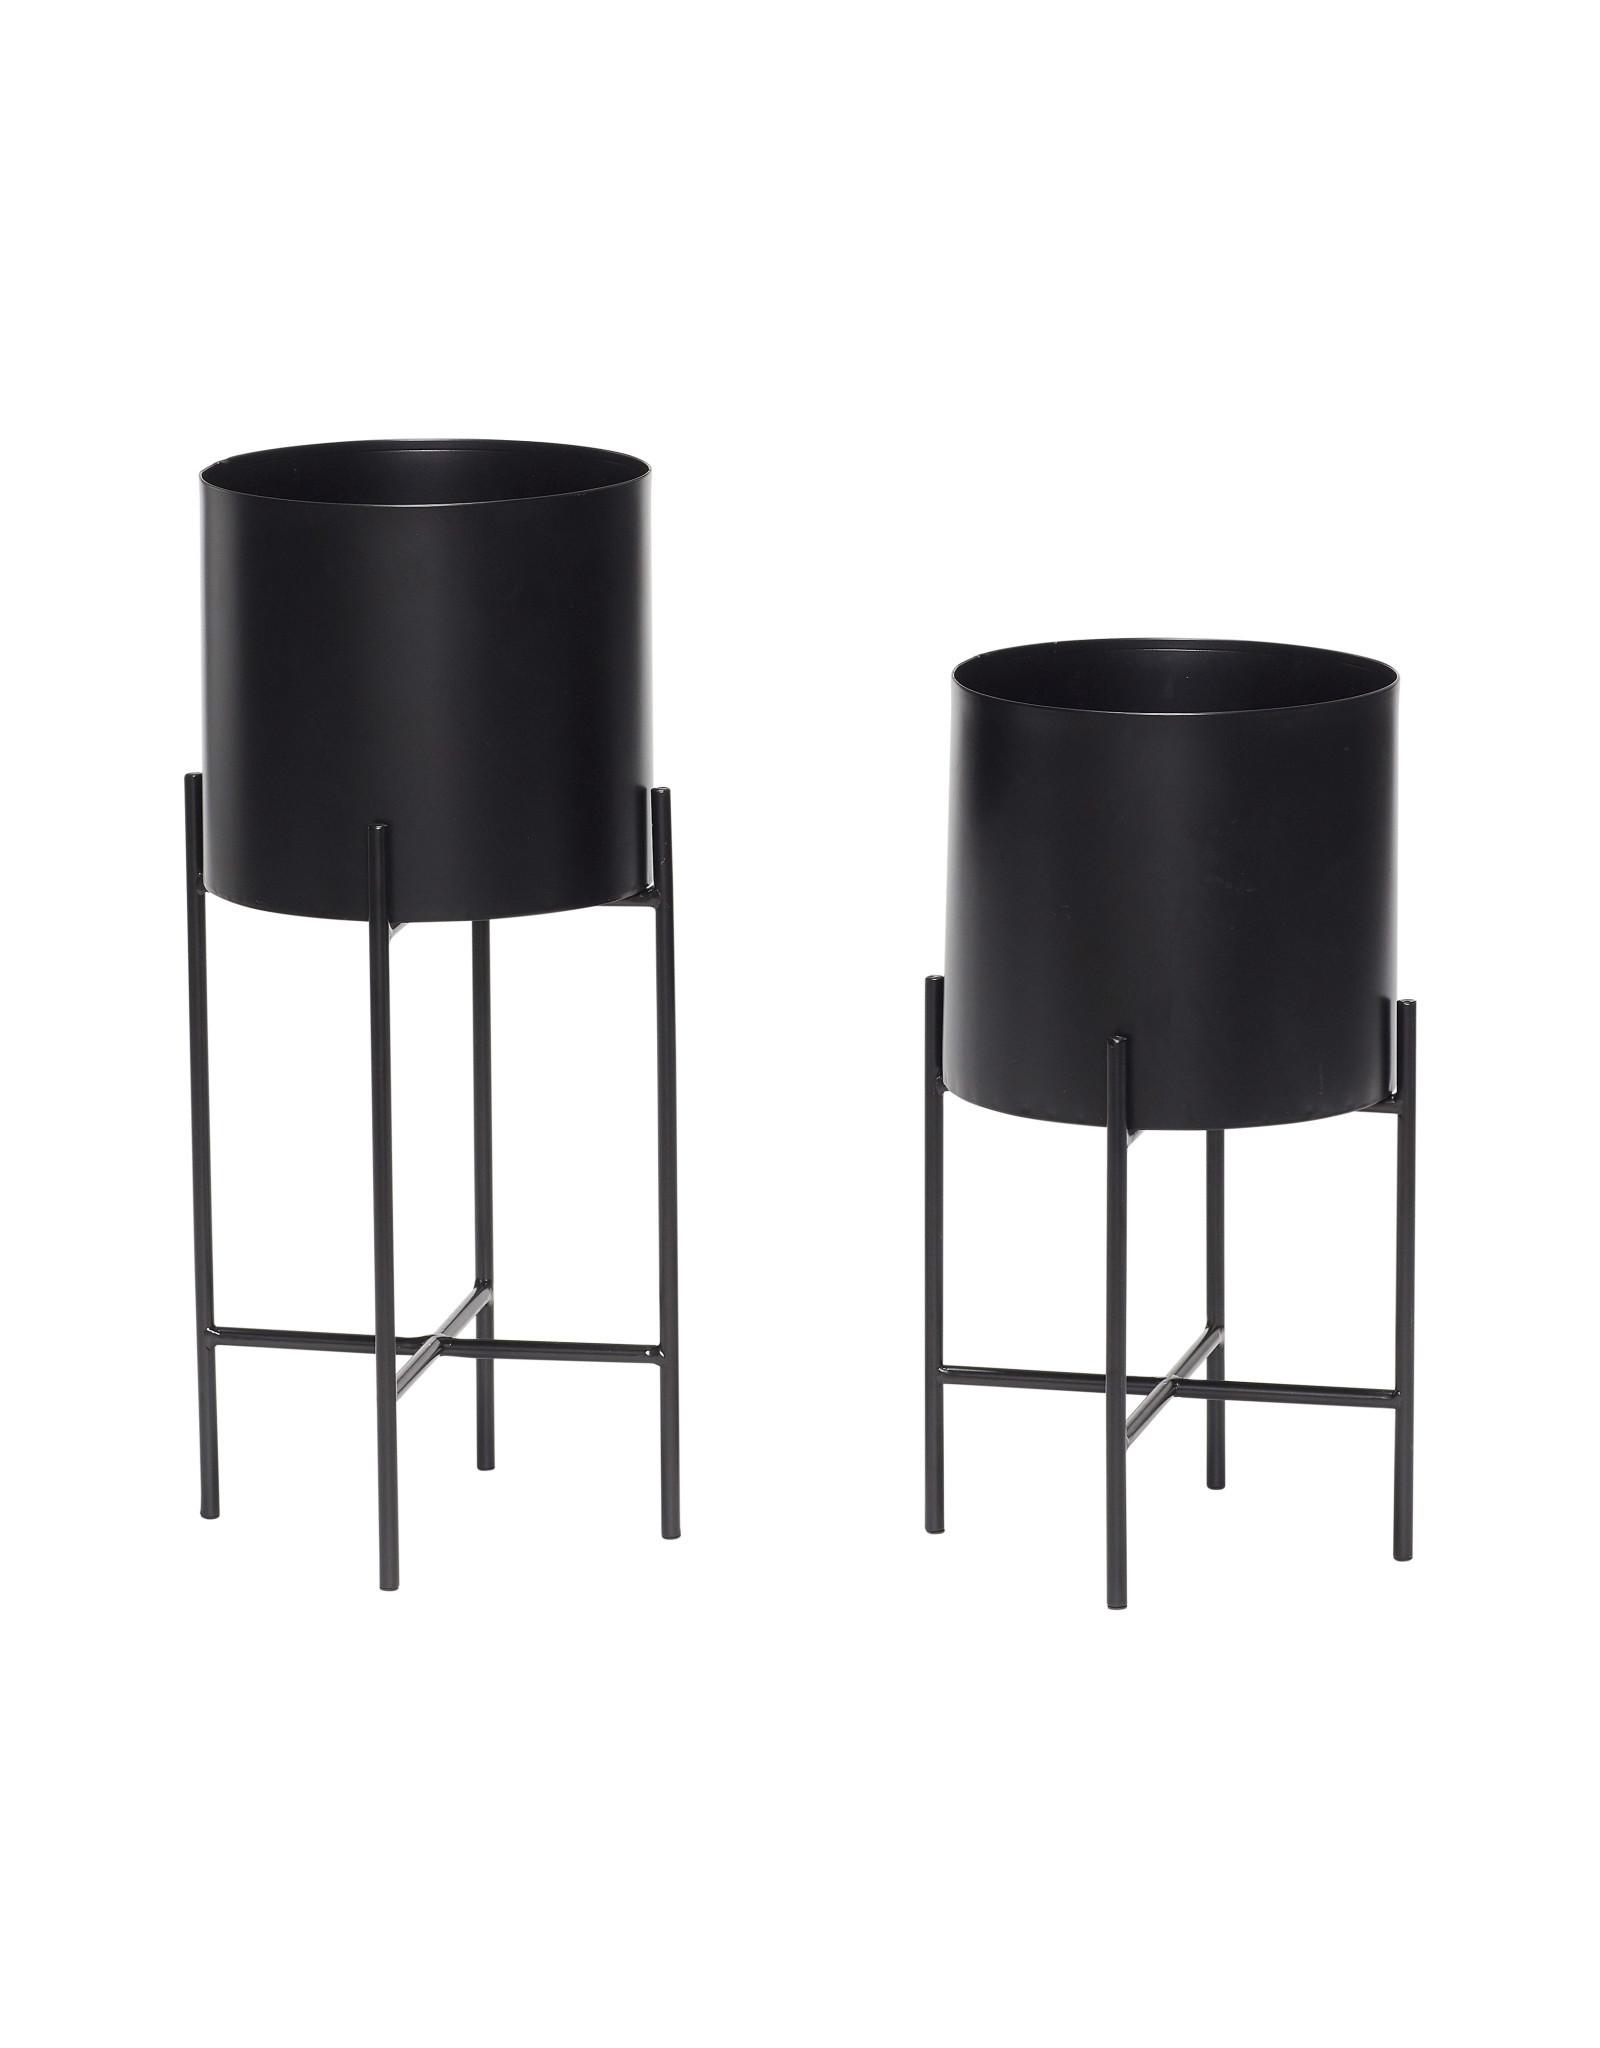 Hübsch Black Pot w/ legs ø23xh45